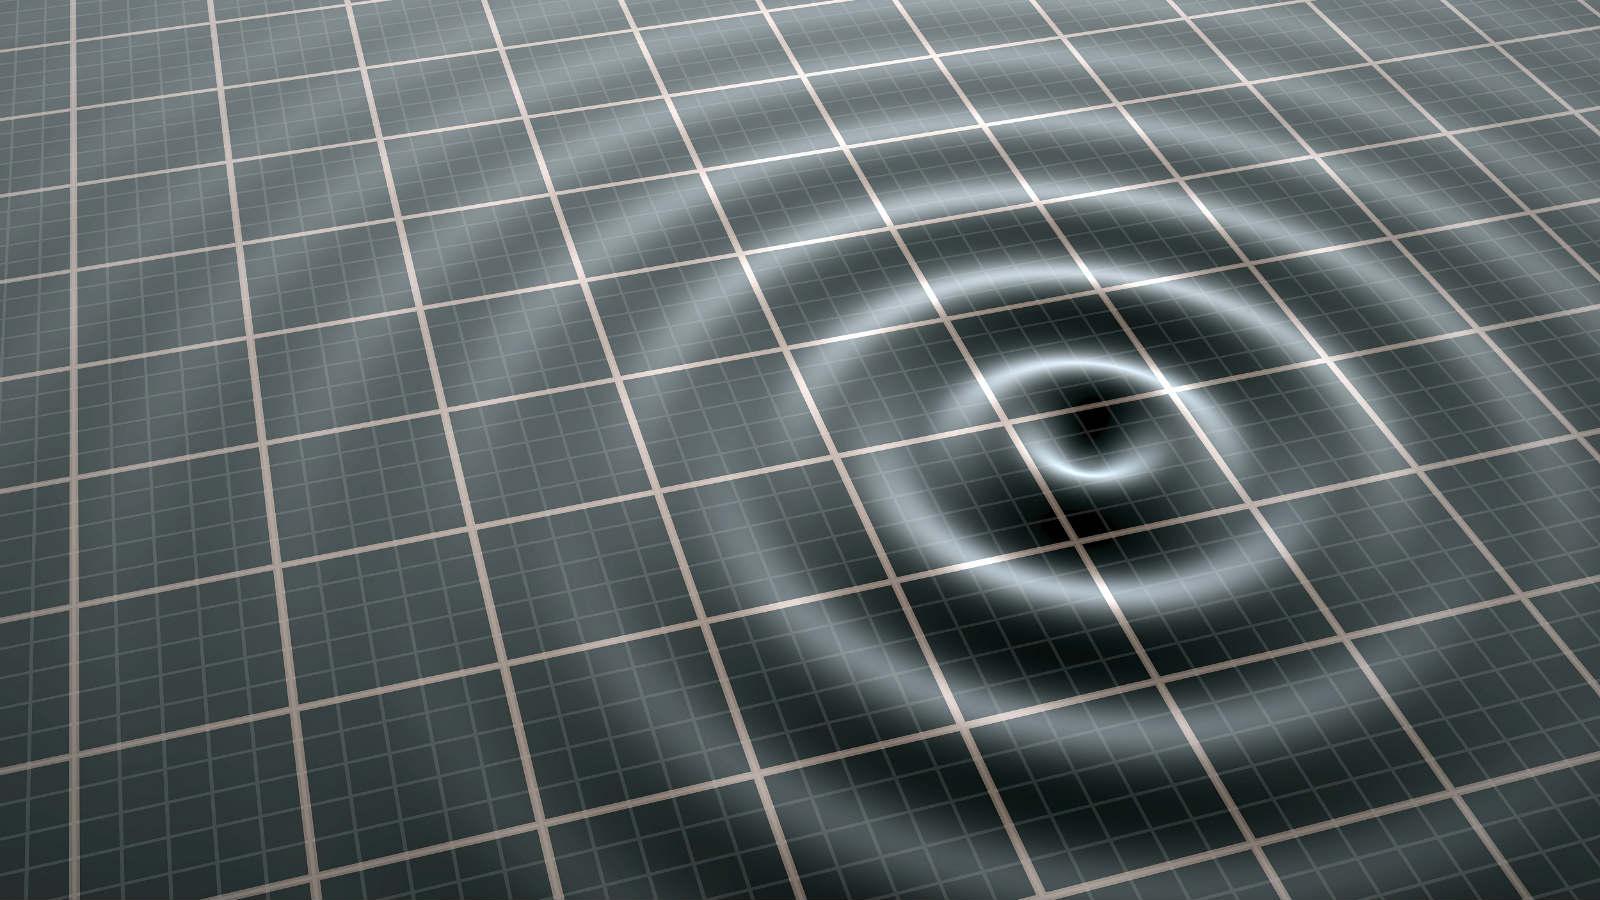 5.5-magnitude quake jolts off north island of New Zealand